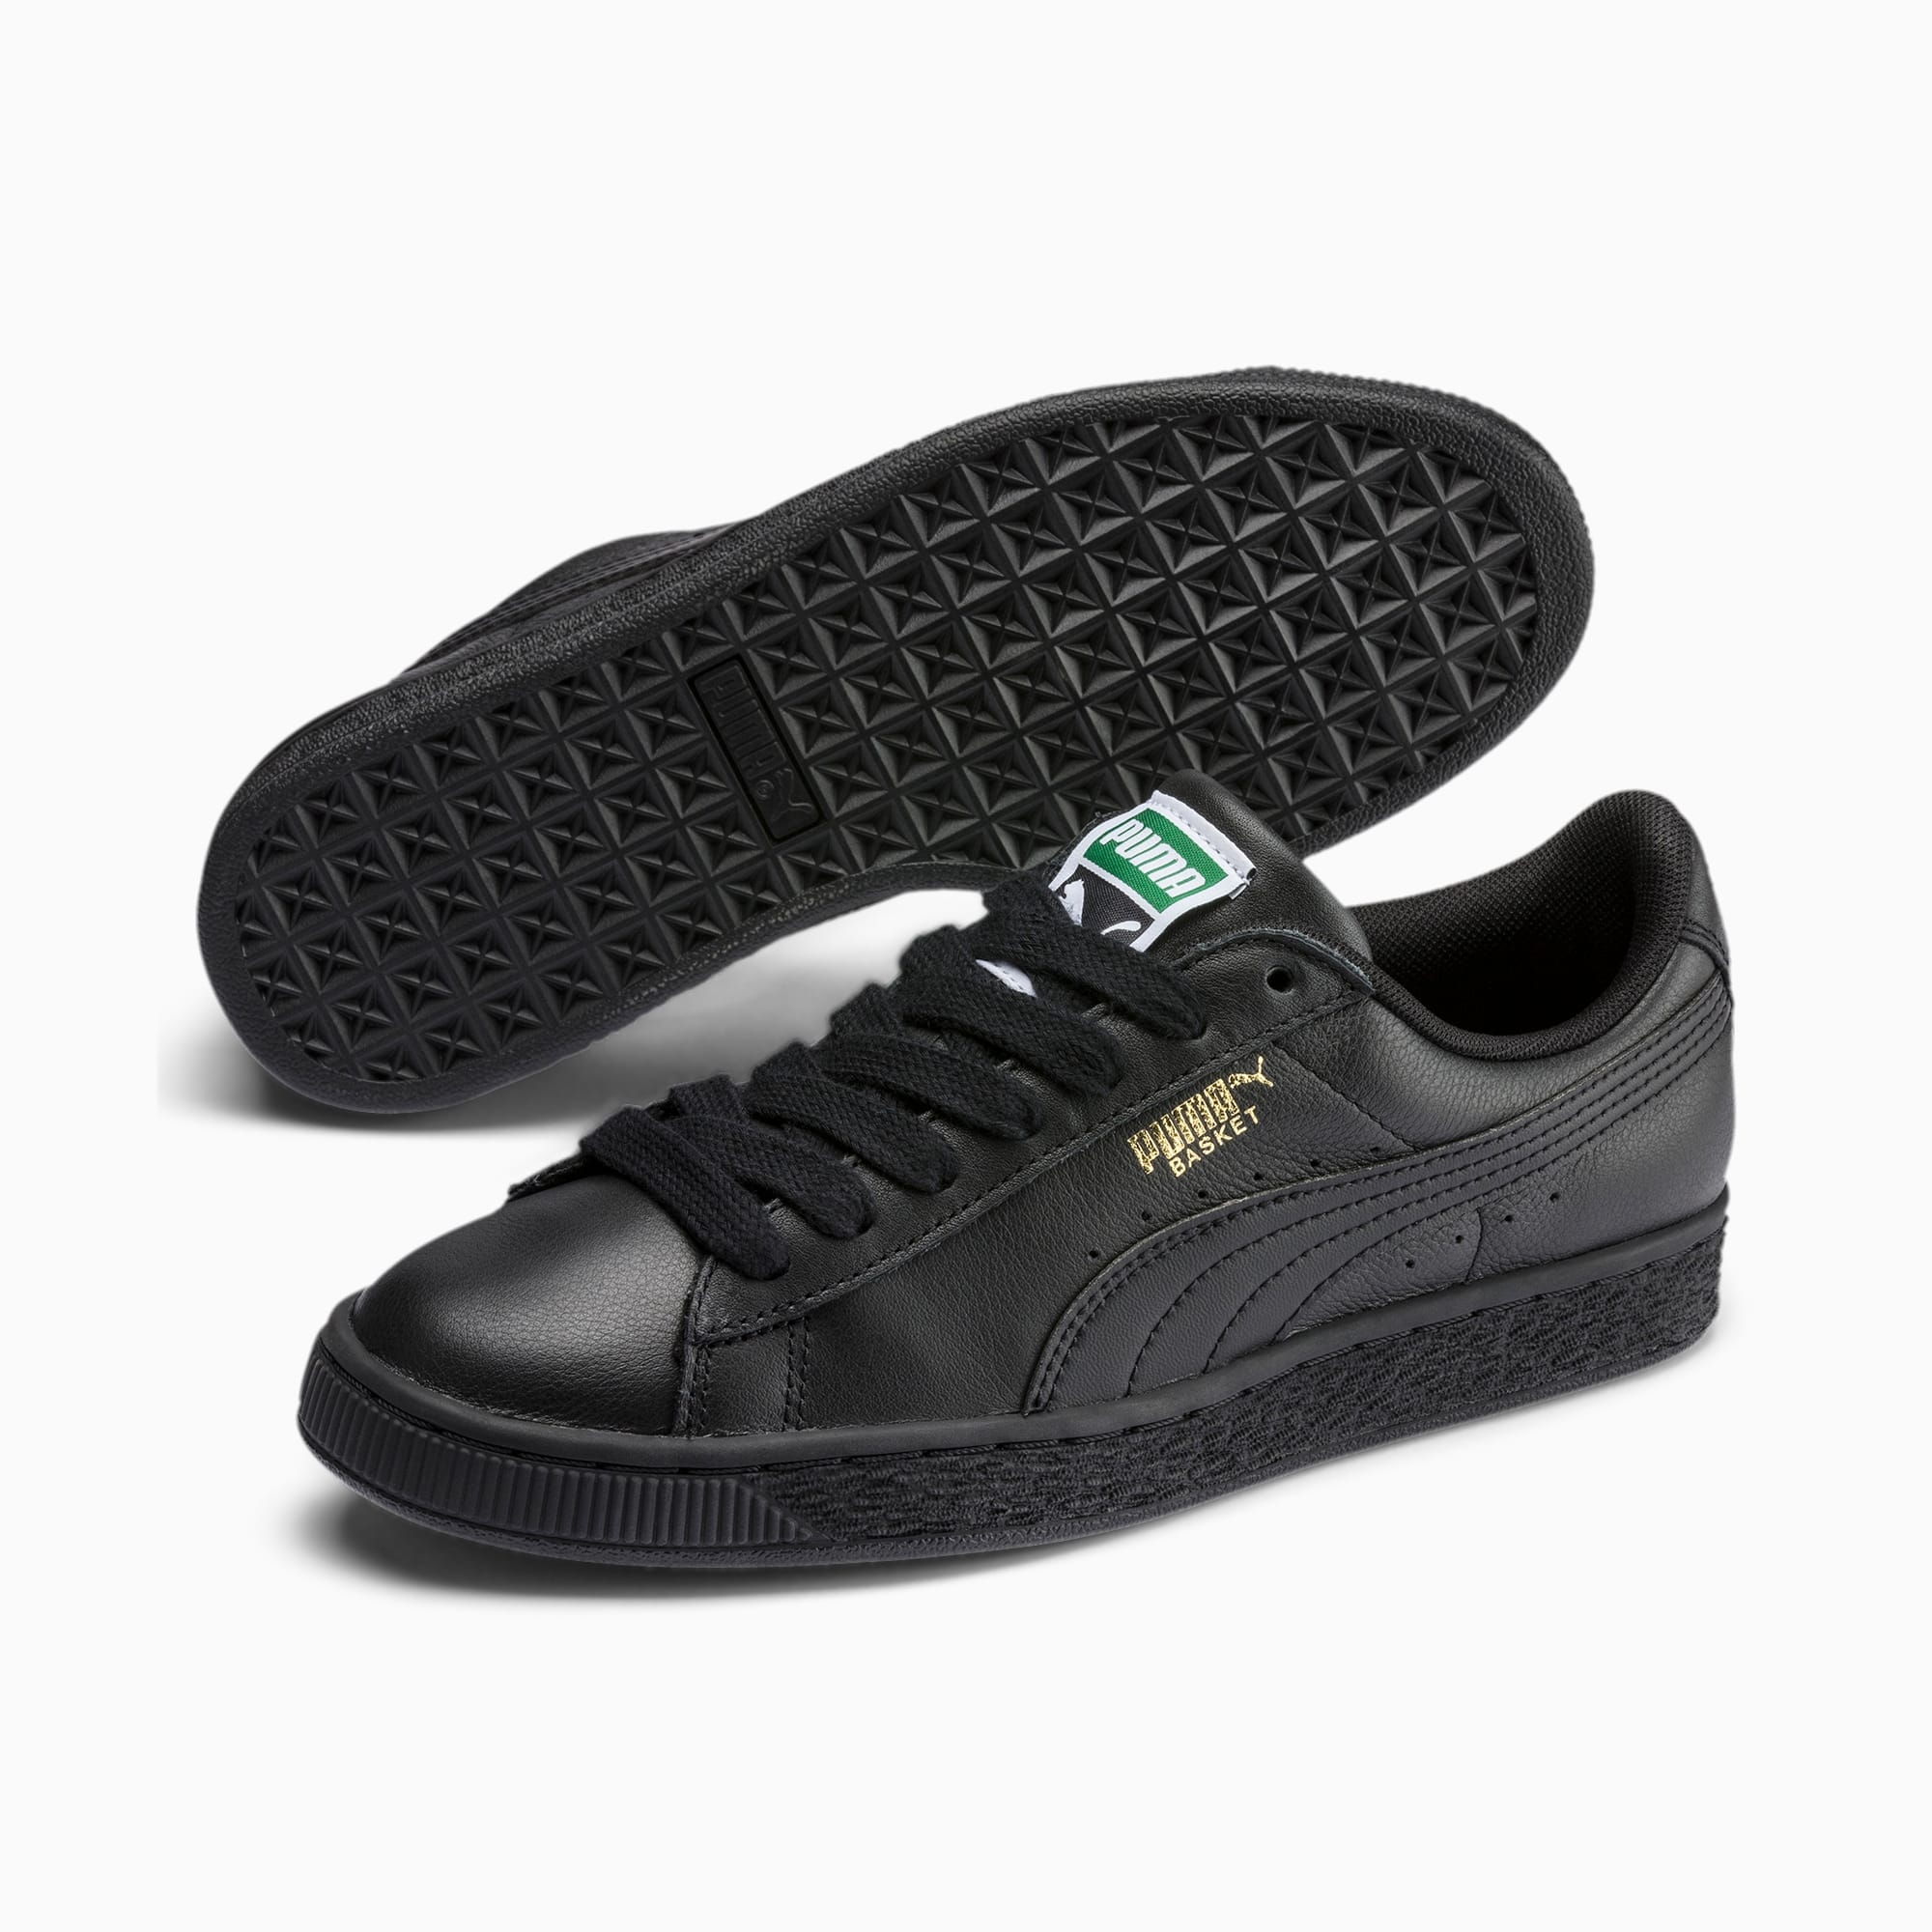 Sneakersy PUMA Basket Classic Lfs 354367 19 BlackTeam Gold